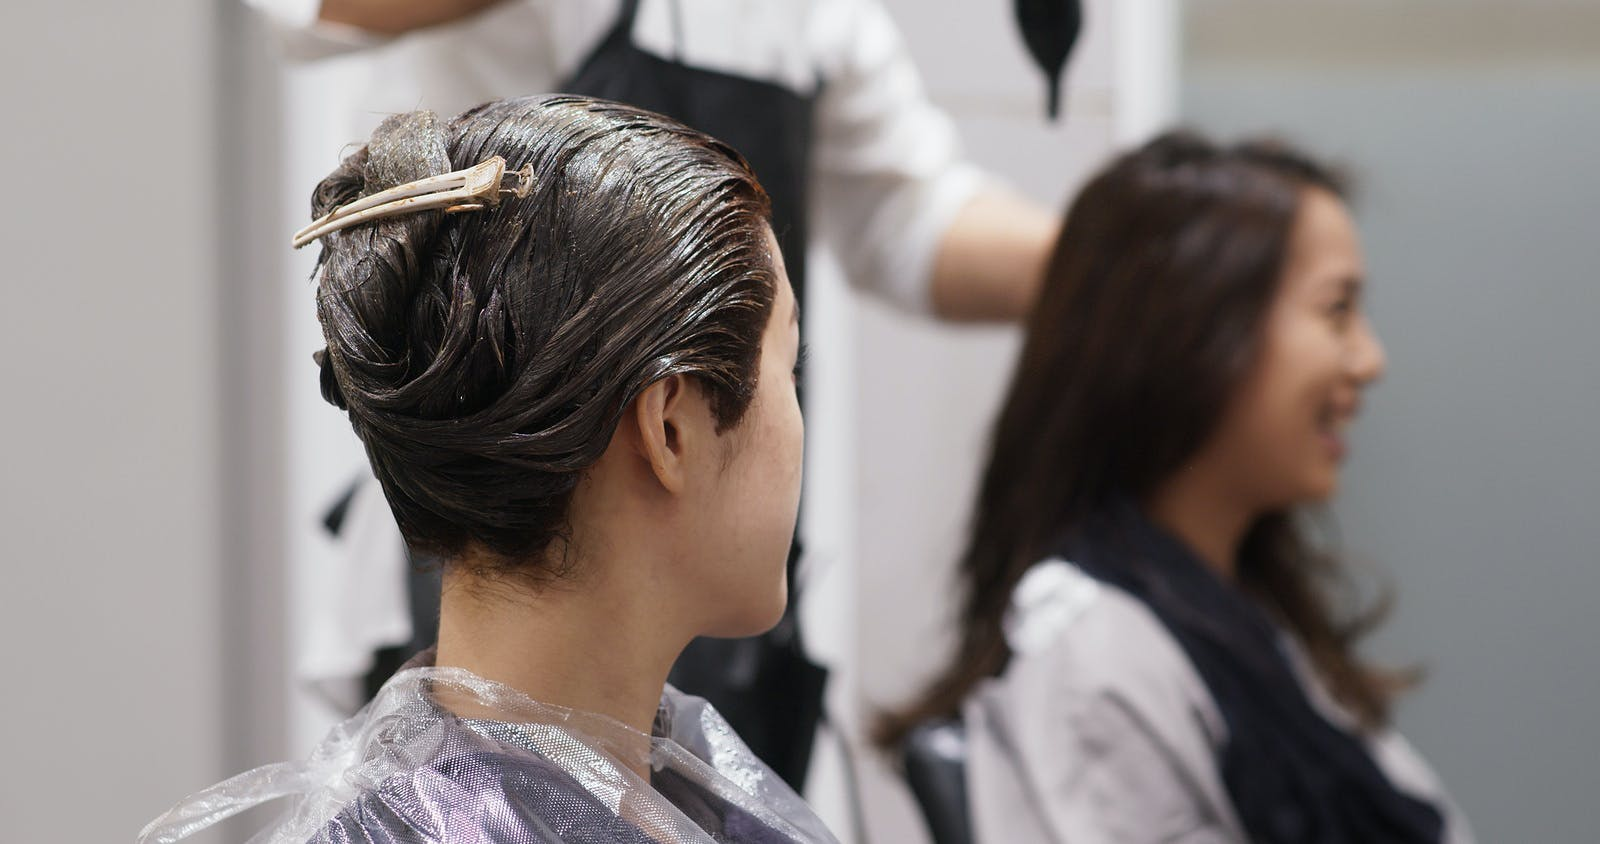 two women wait for hair dyes in salon